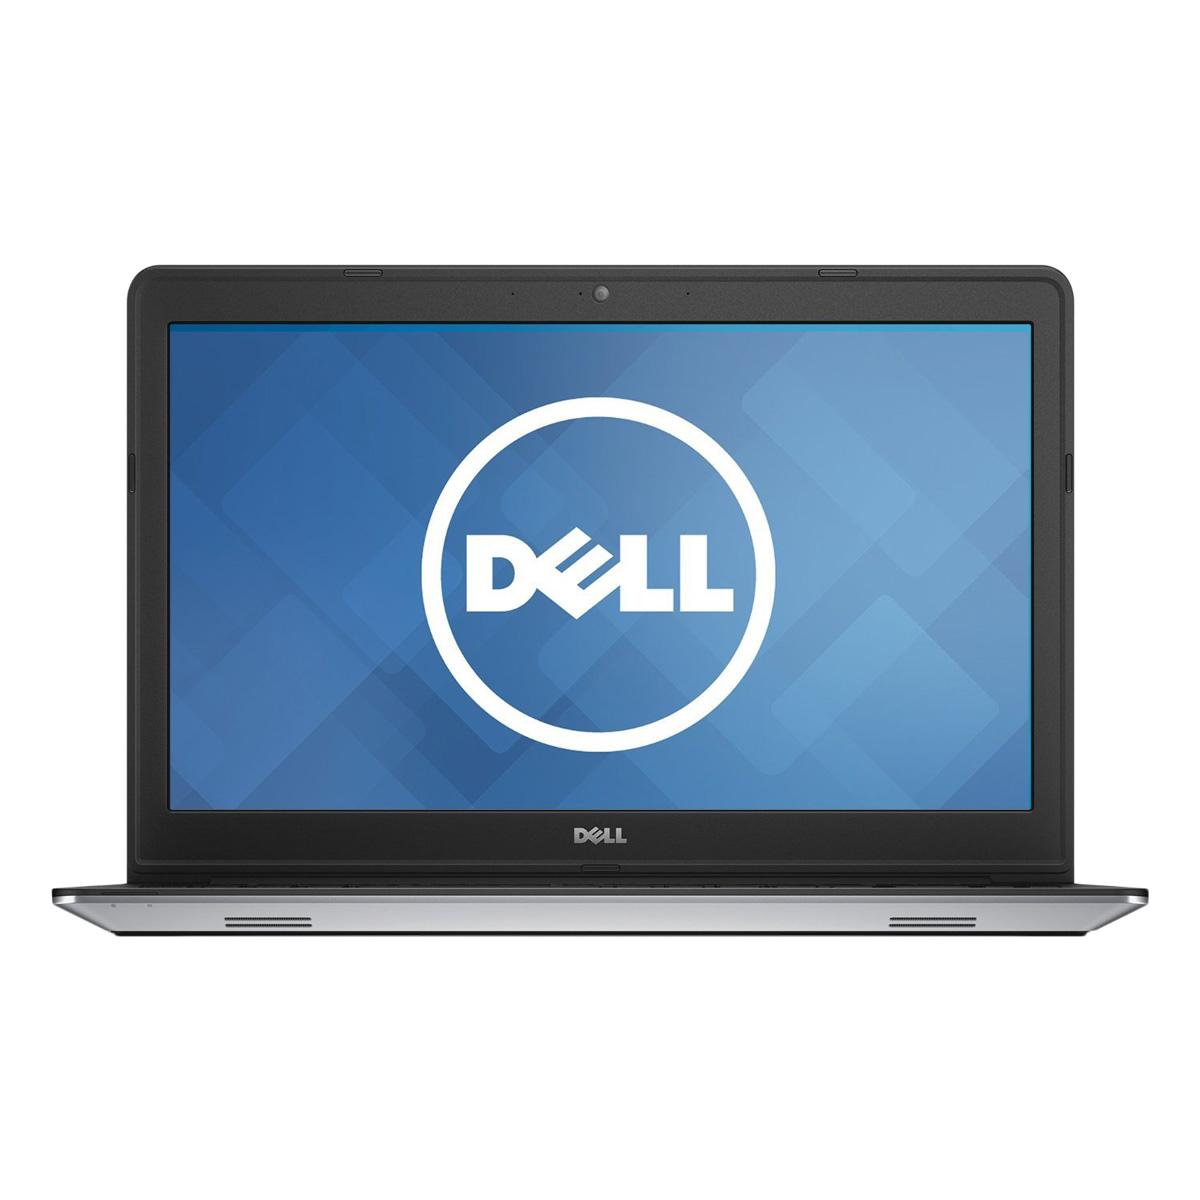 Dell Inspiron 5548 JJ9G01